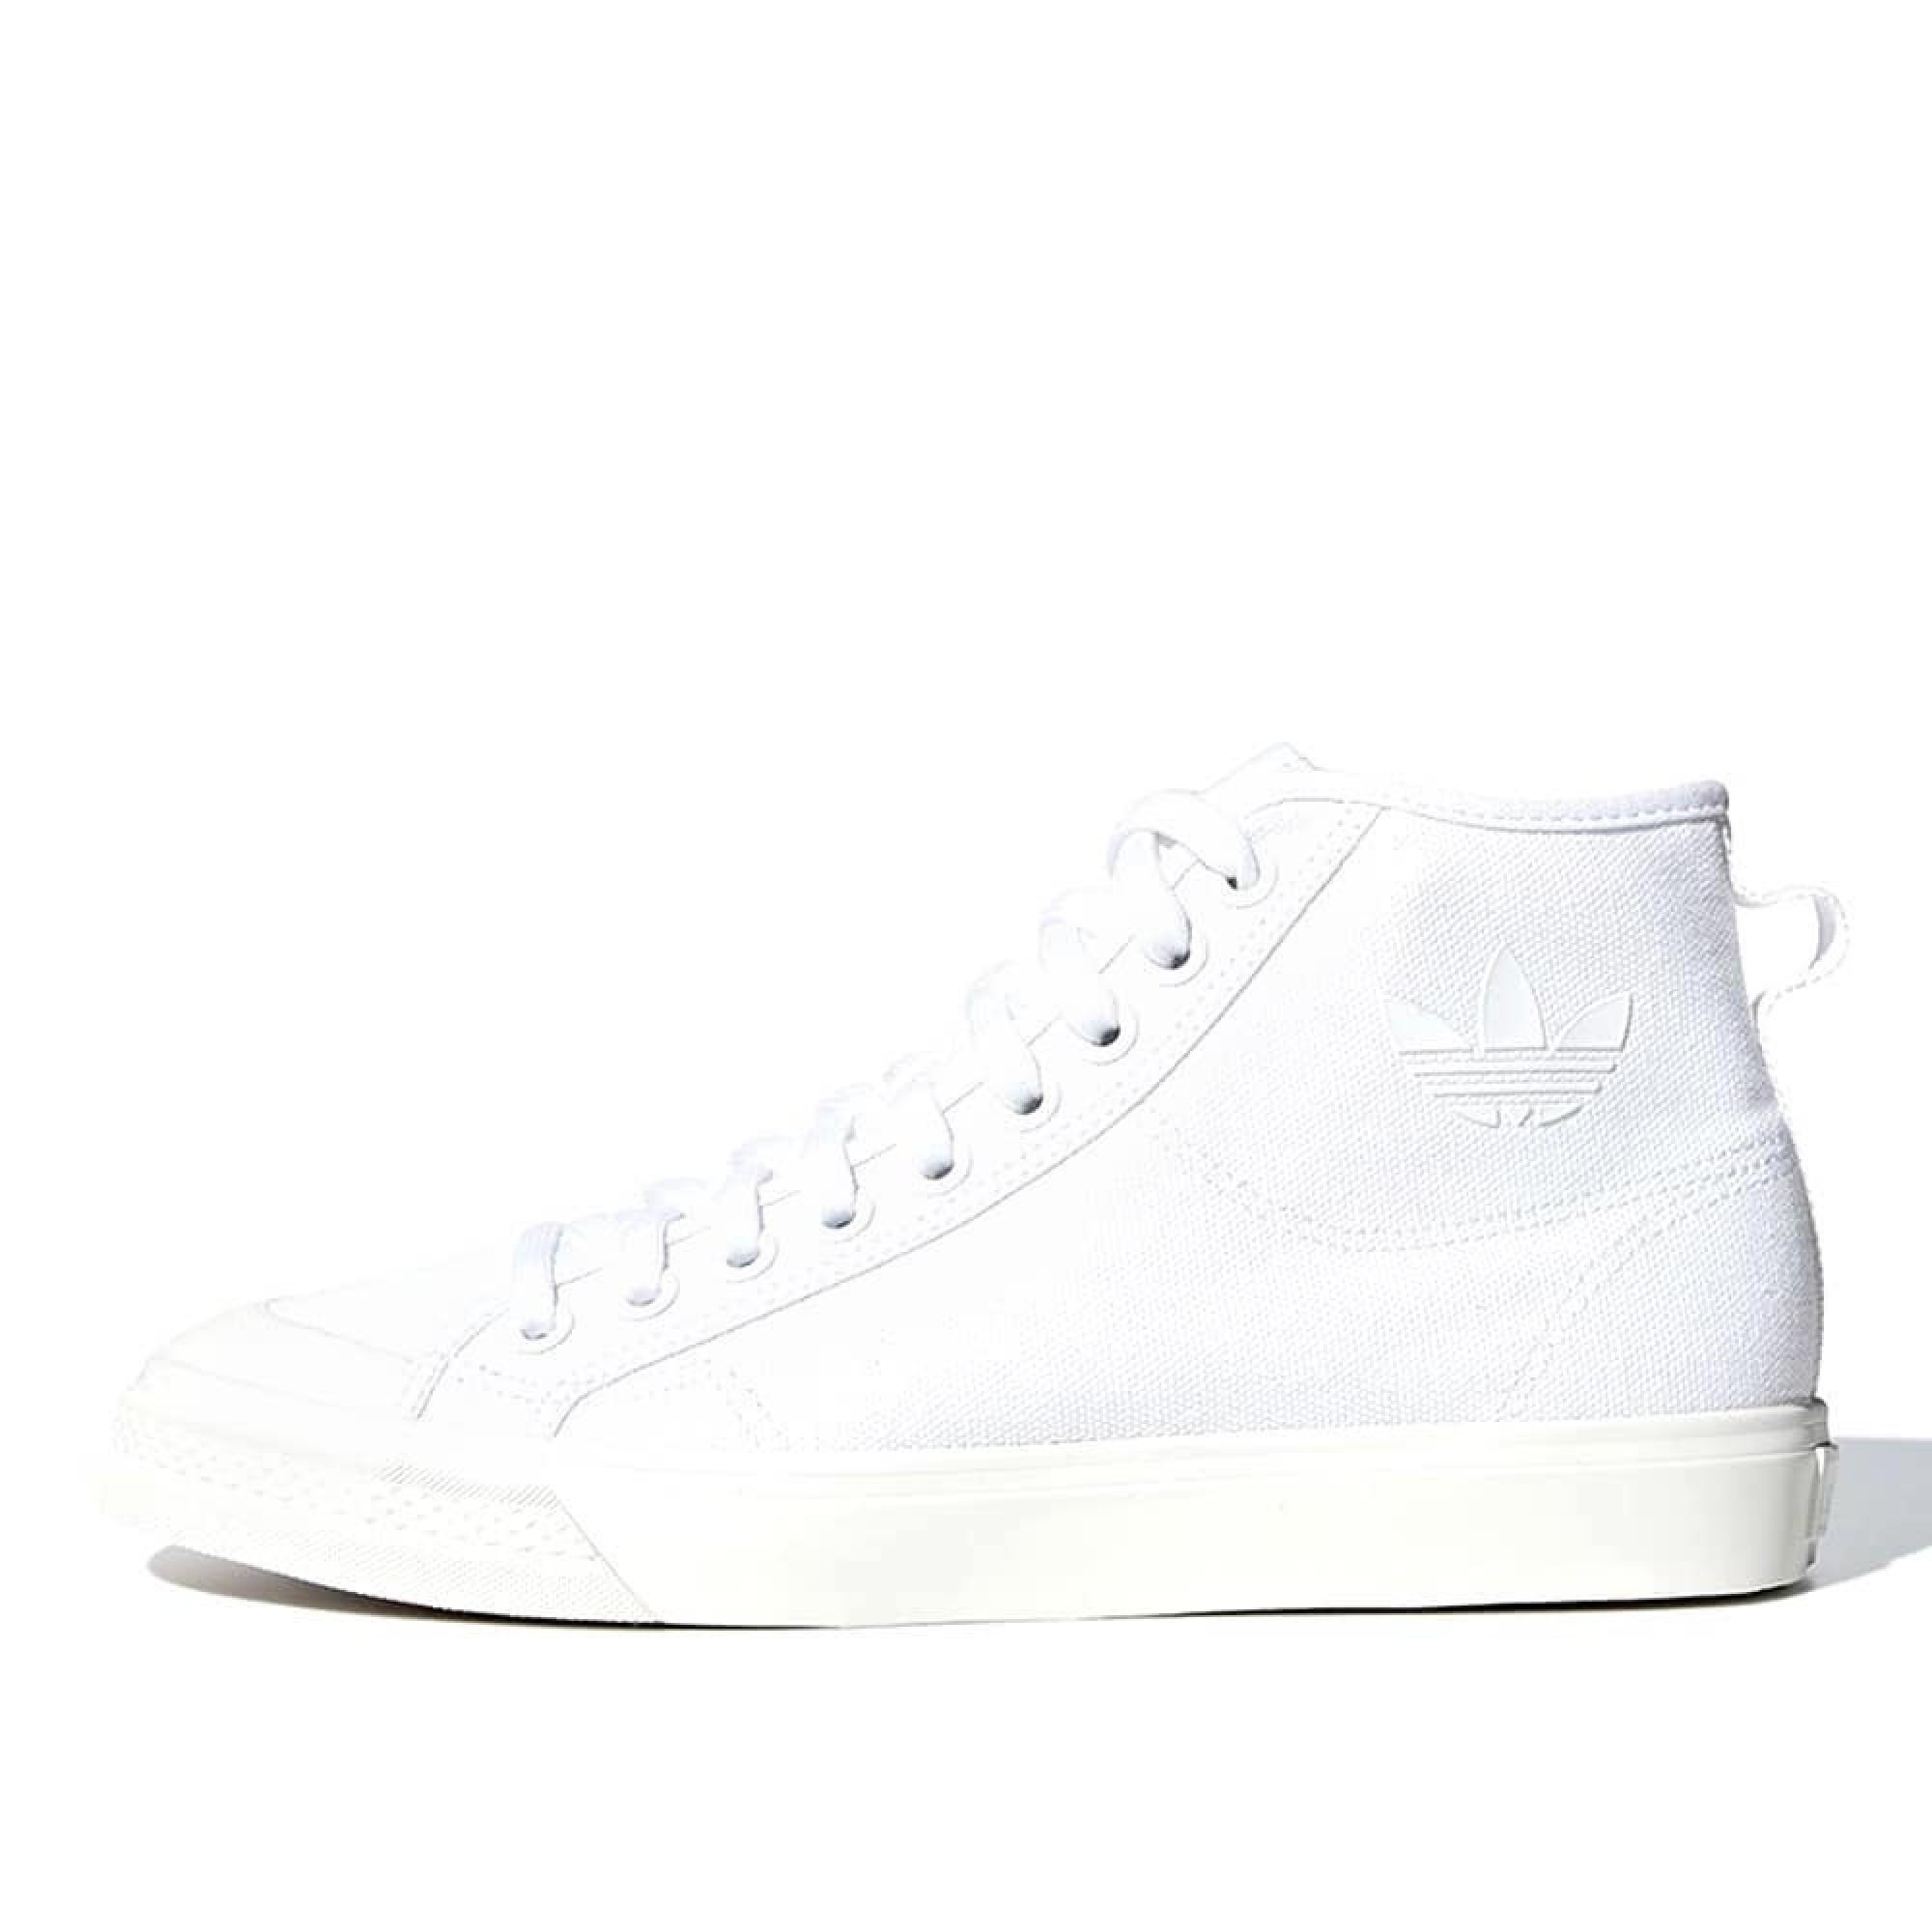 promo code 590f2 85518 Adidas Originals - Nizza Hi Top (White  Off White)  B41643